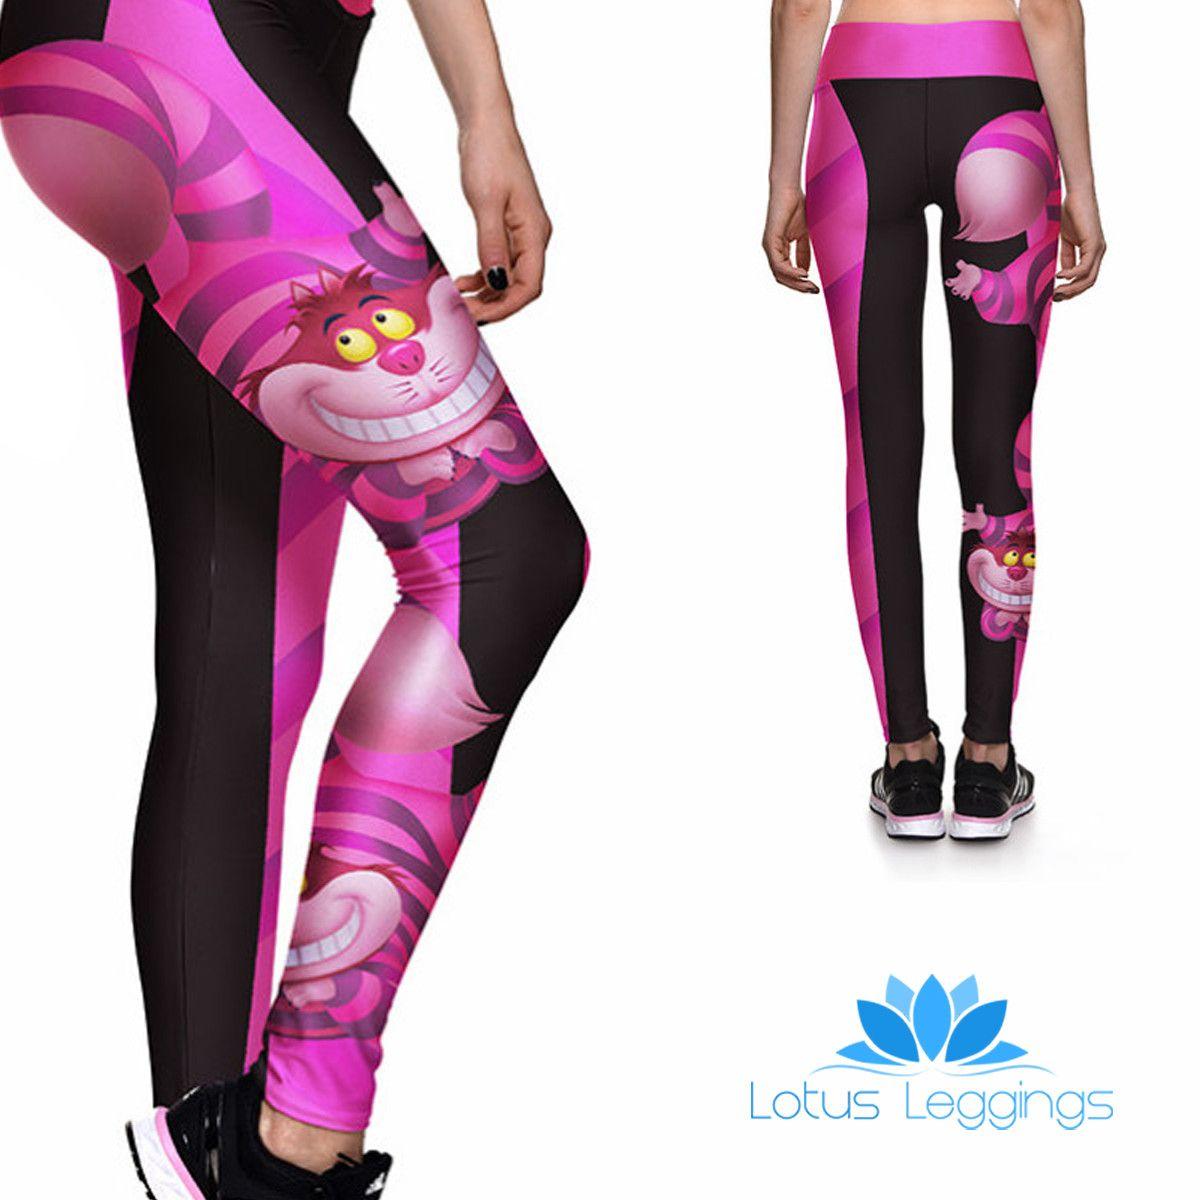 55badb9a9ba0d CHESHIRE CAT ATHLETIC LEGGINGS – Lotus Leggings | :My Style ...